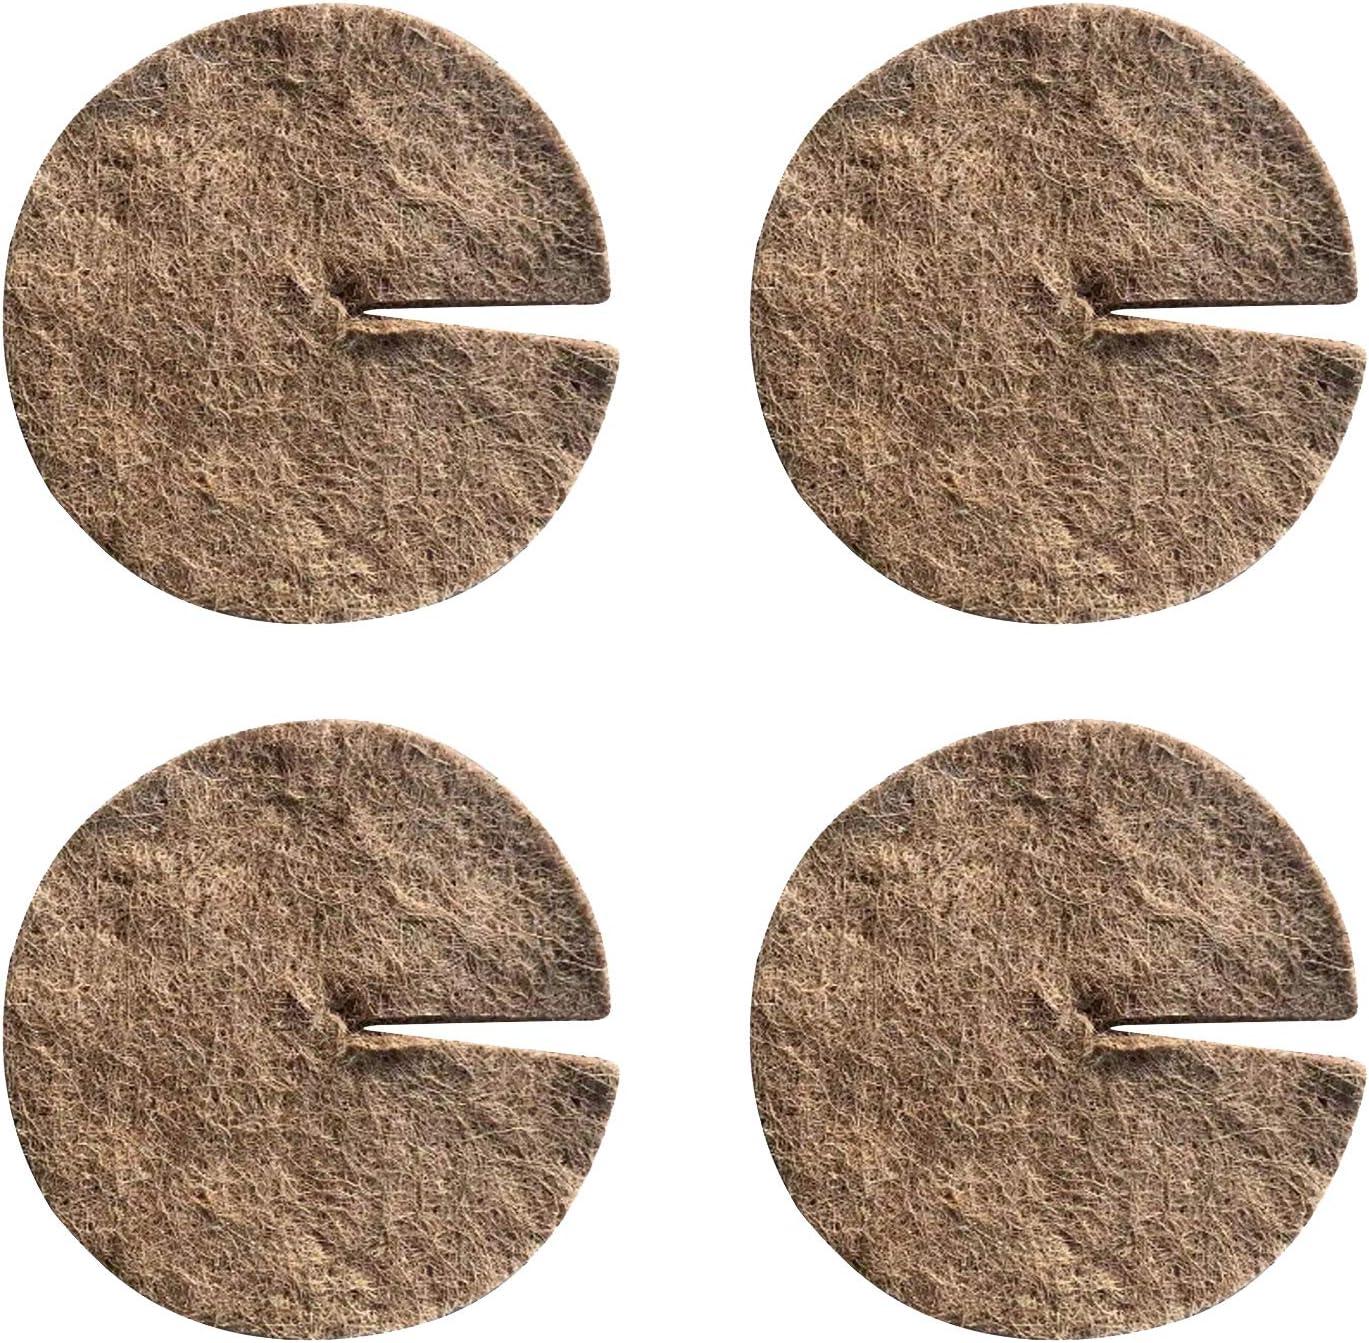 2Krmstr 4 PCS Coconut Fibers Tree Rings Daily Indefinitely bargain sale Protector 11. Plant Mat